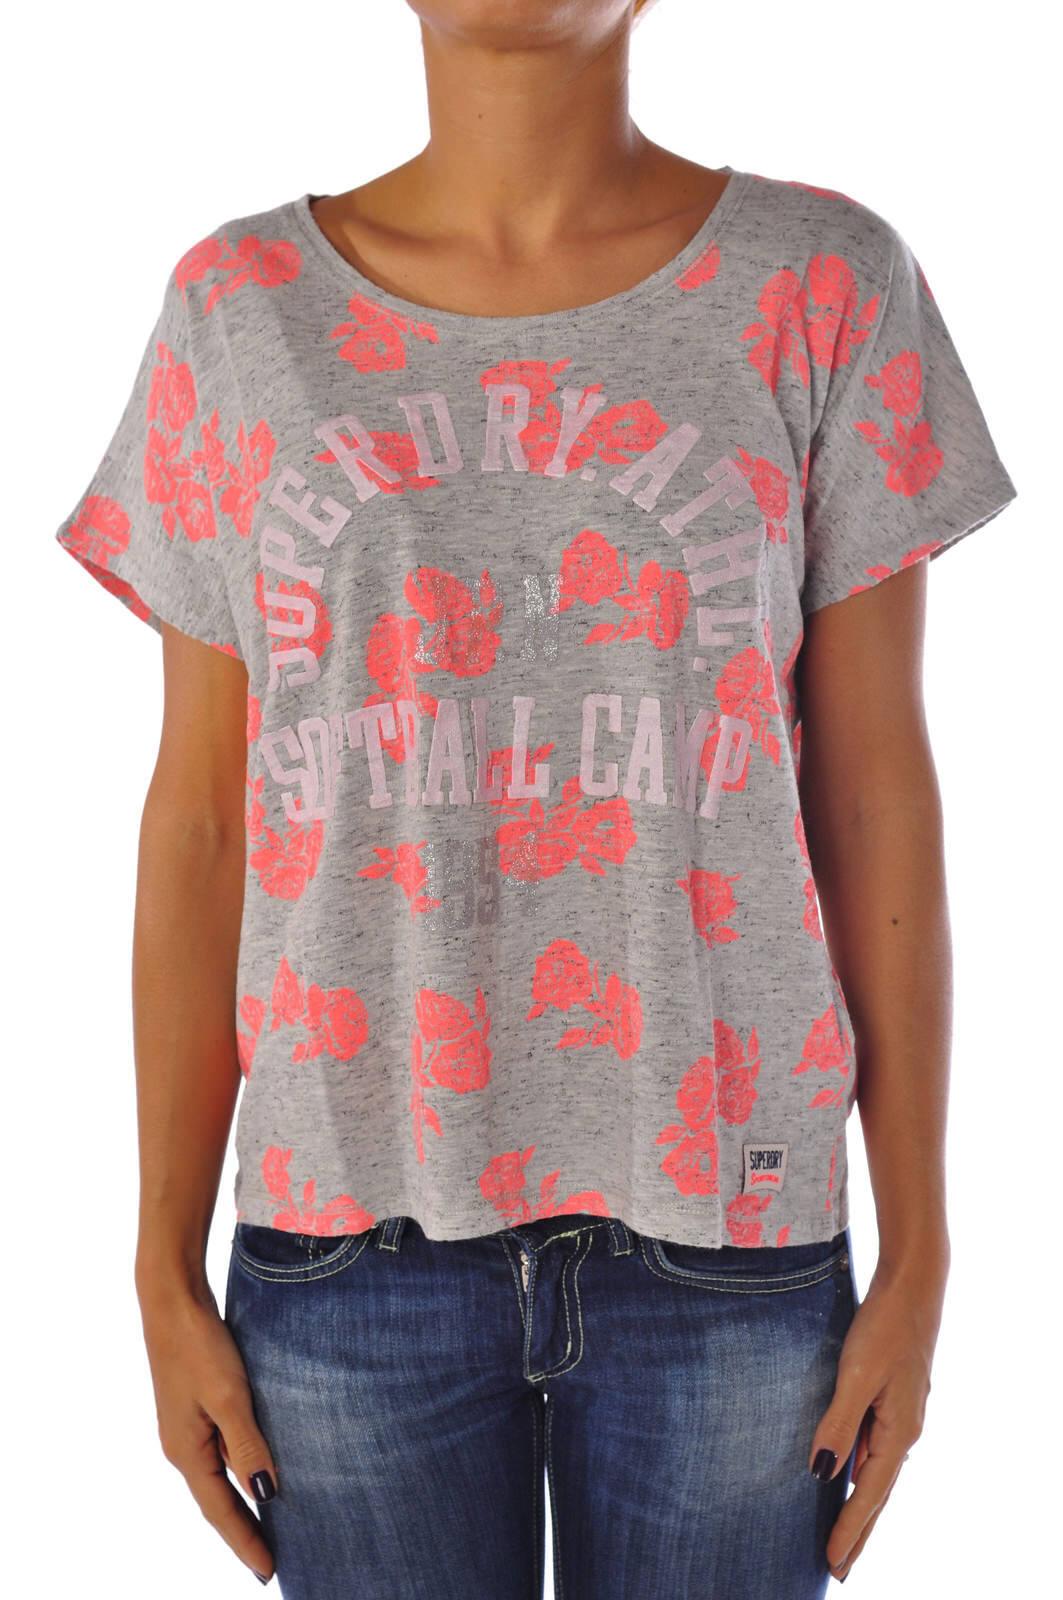 Superdry - Topwear-T-shirts - Woman - grau - 969718C184132